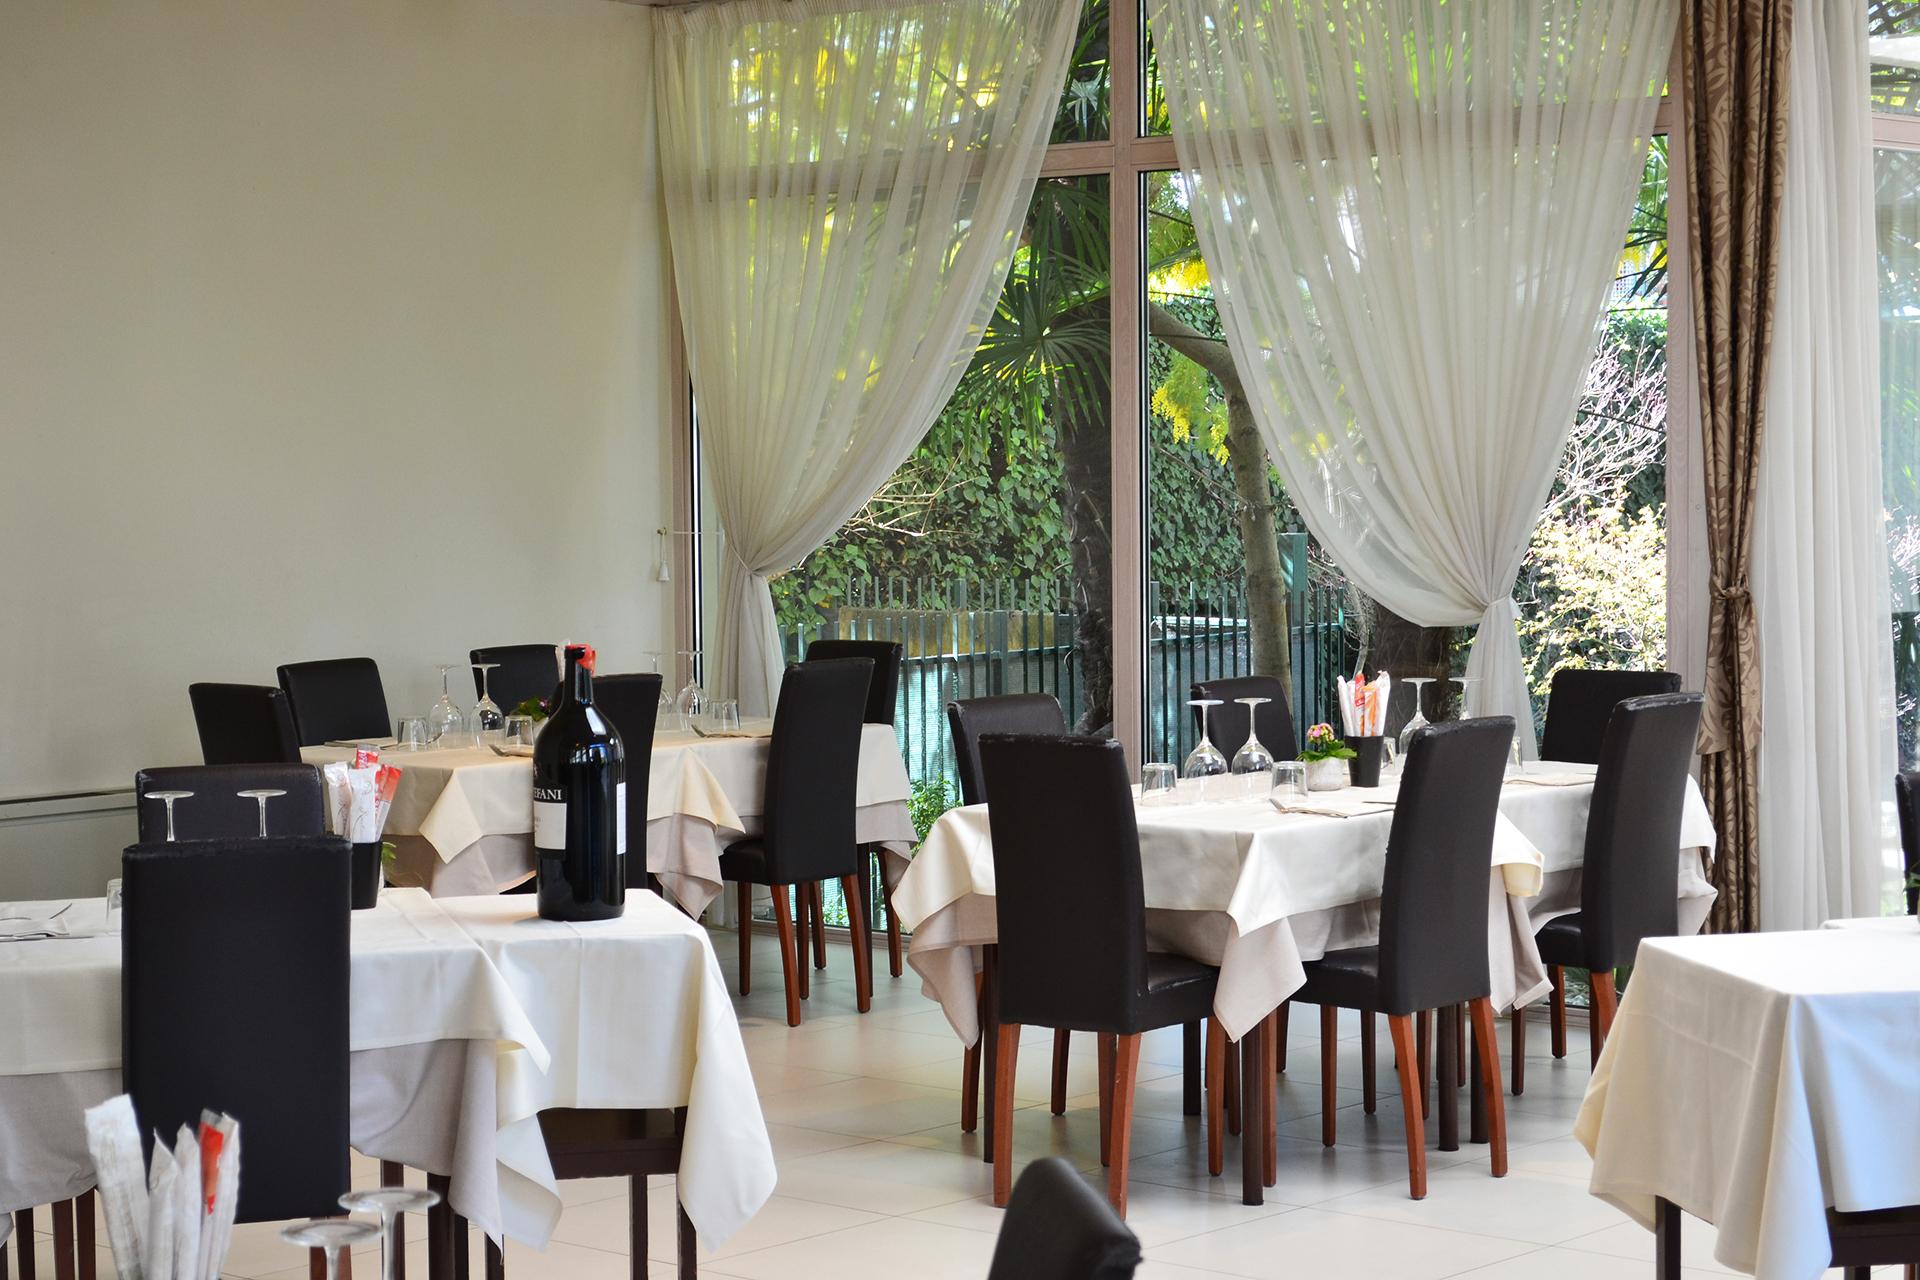 Cucina tradizionale Verona